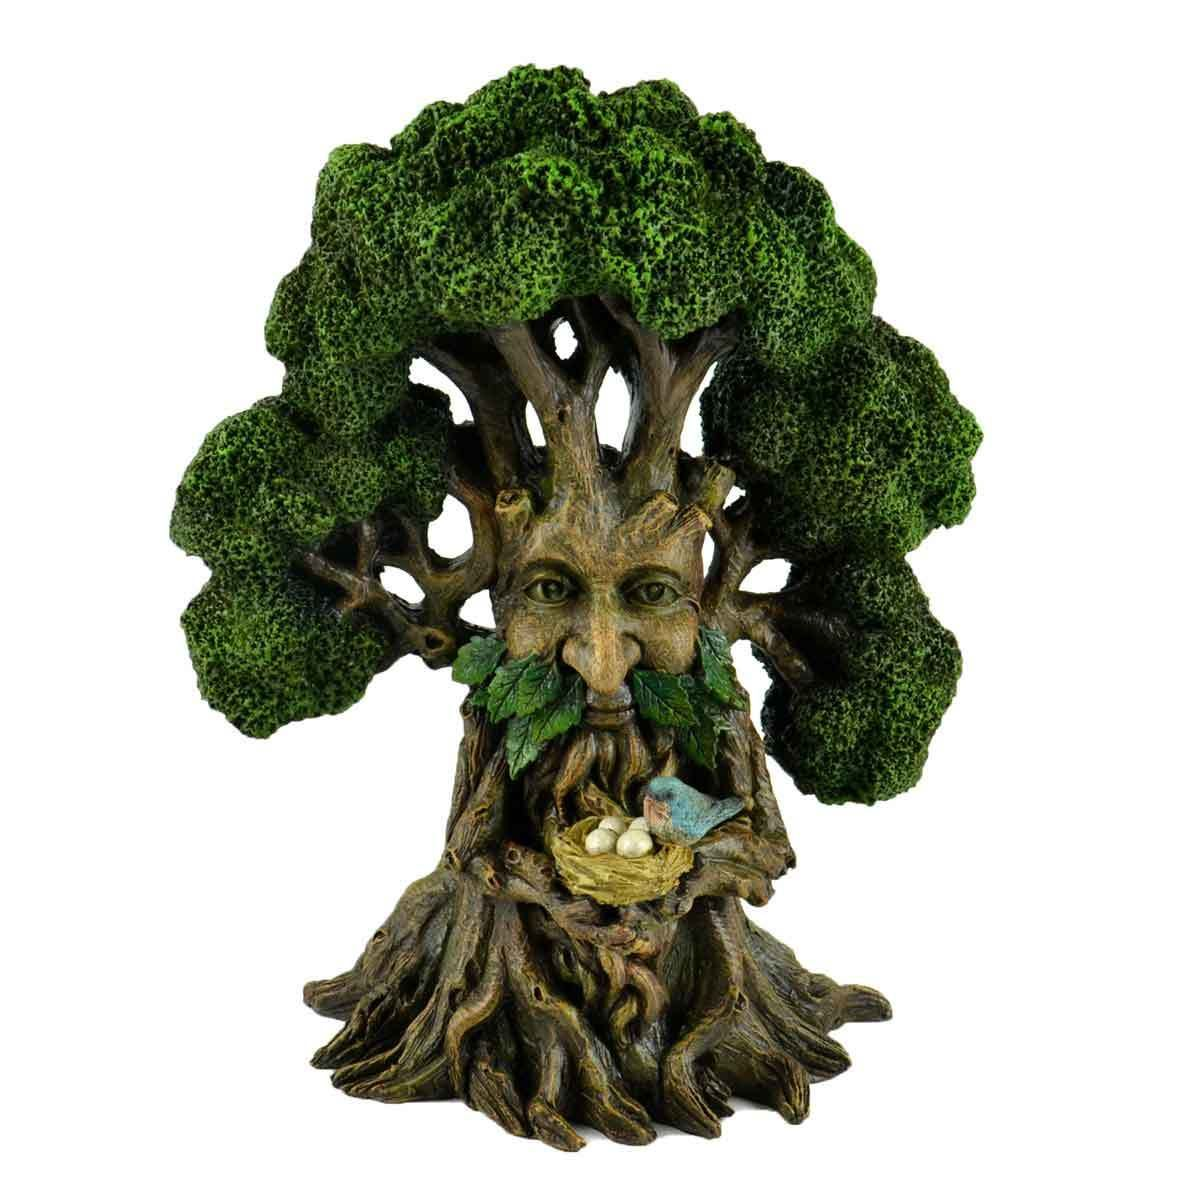 Miniature Dollhouse FAIRY GARDEN Tree With Face Holding Nest